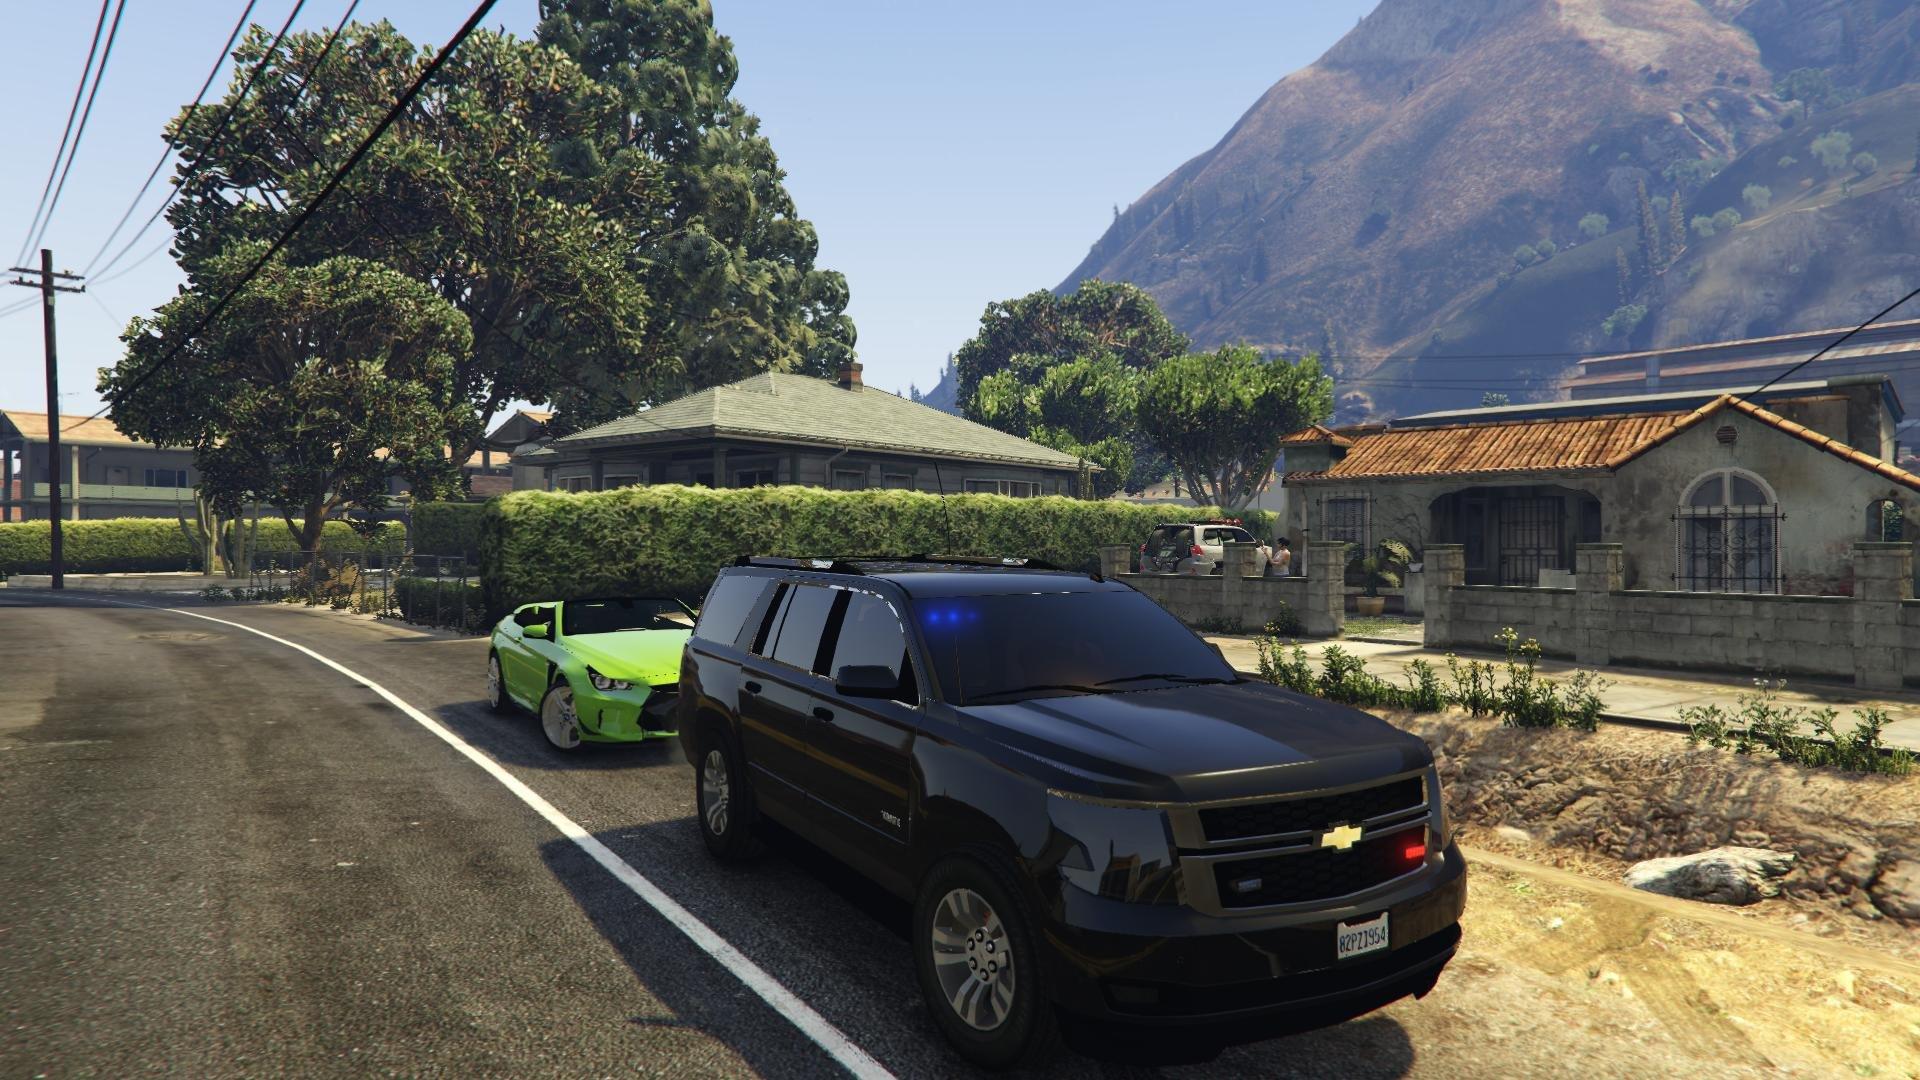 Chevrolet Avalanche 2016 >> Chevrolet Tahoe 2015 FBI (Unlocked) - Vehicules pour GTA V ...